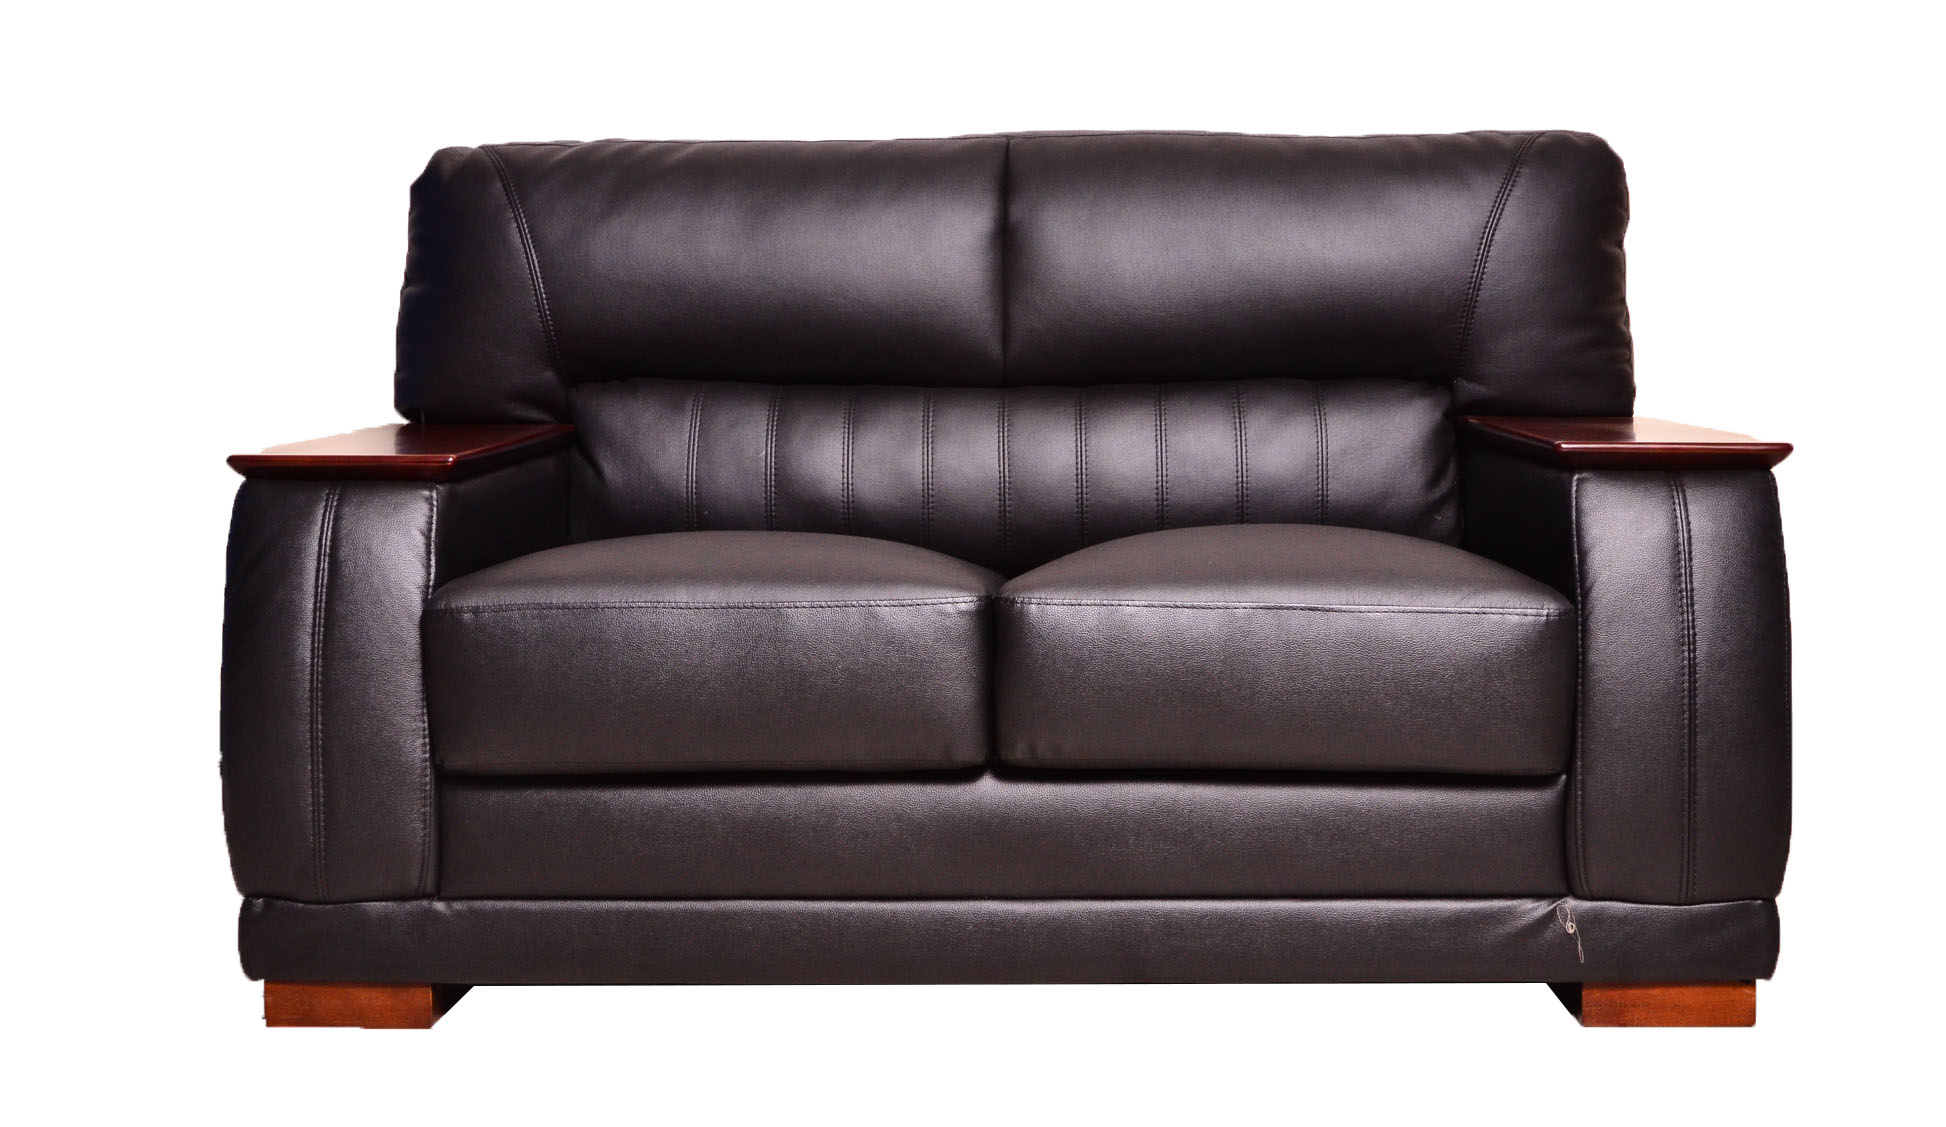 Visitor's Sofa Set